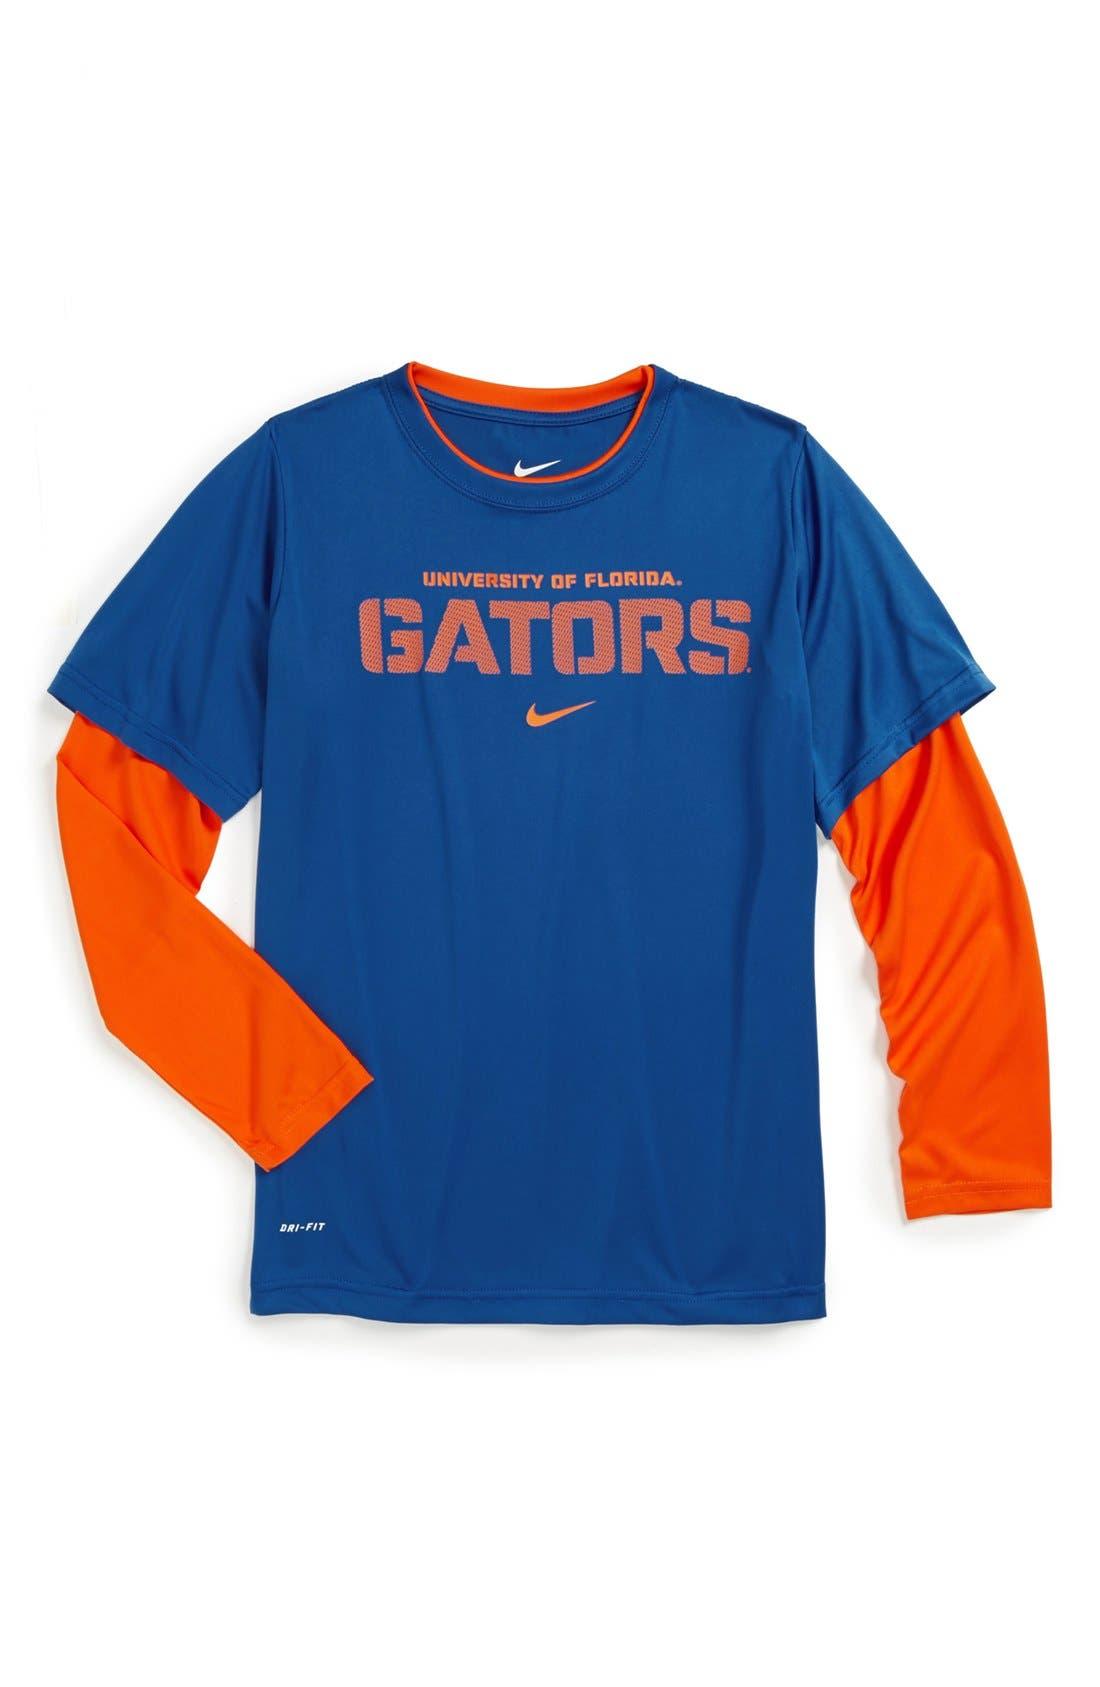 Main Image - Nike 'University of Florida Gators' Dri-FIT Layered Sleeve Sport T-Shirt (Big Boys)